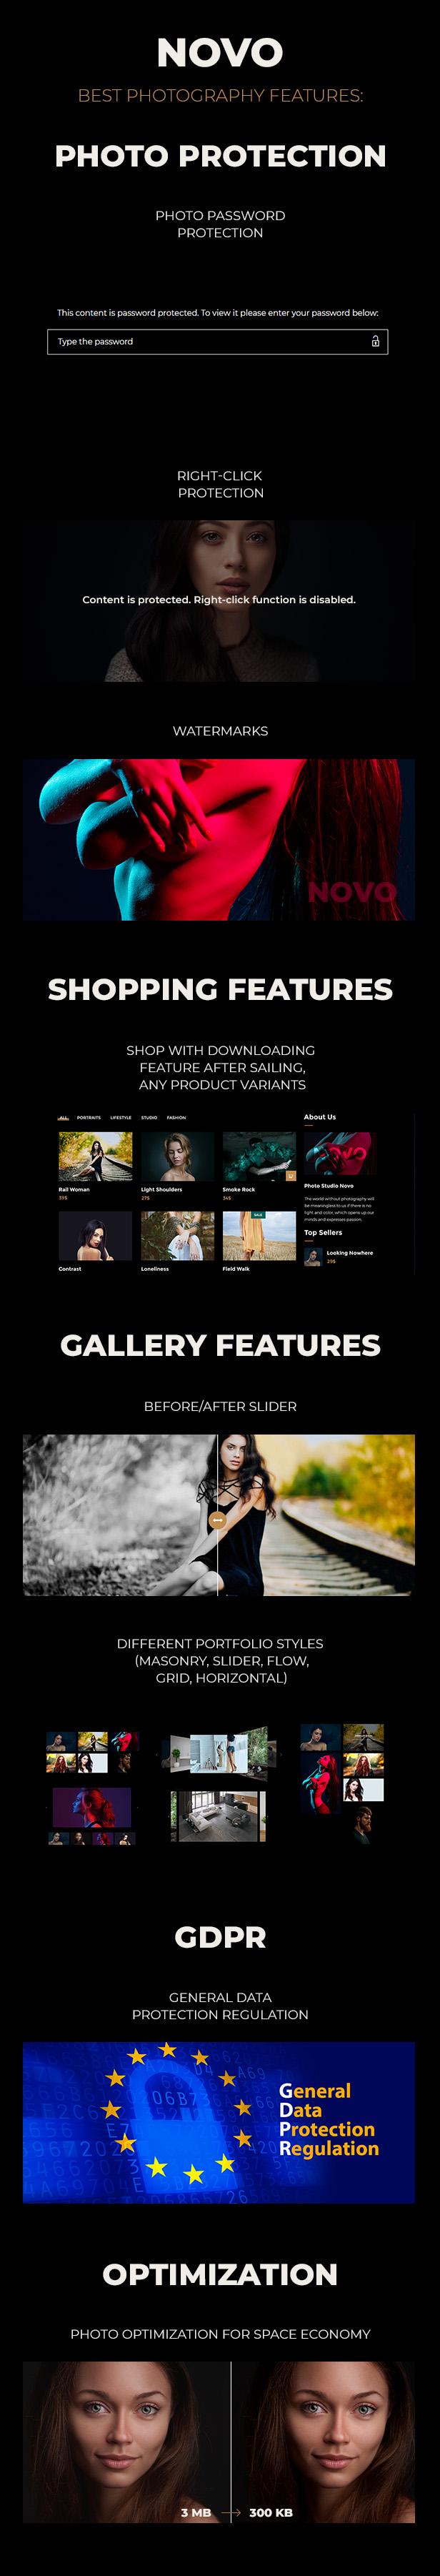 Novo - Photography - 6